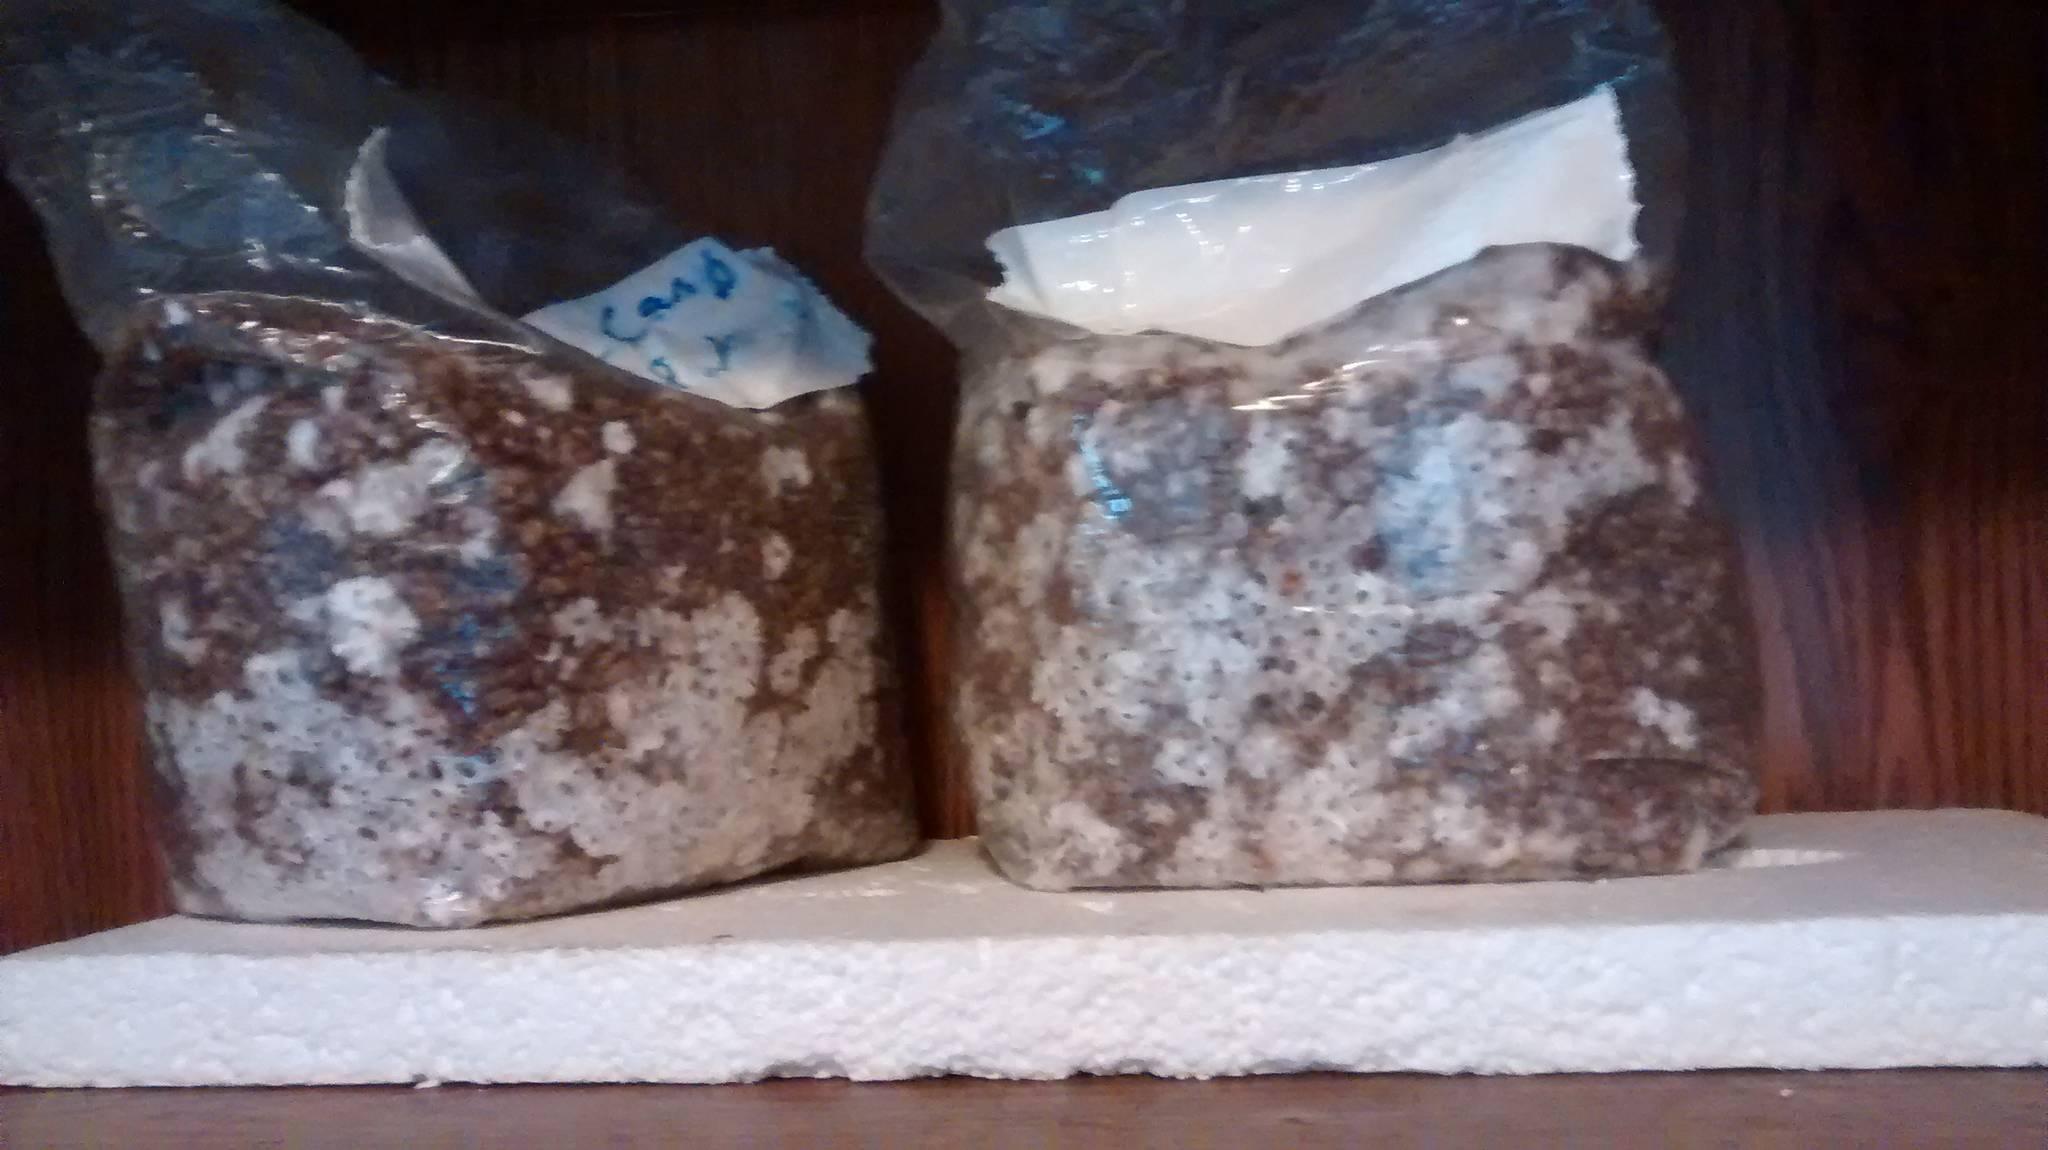 Experimental spawn bag update! - Mushroom Cultivation